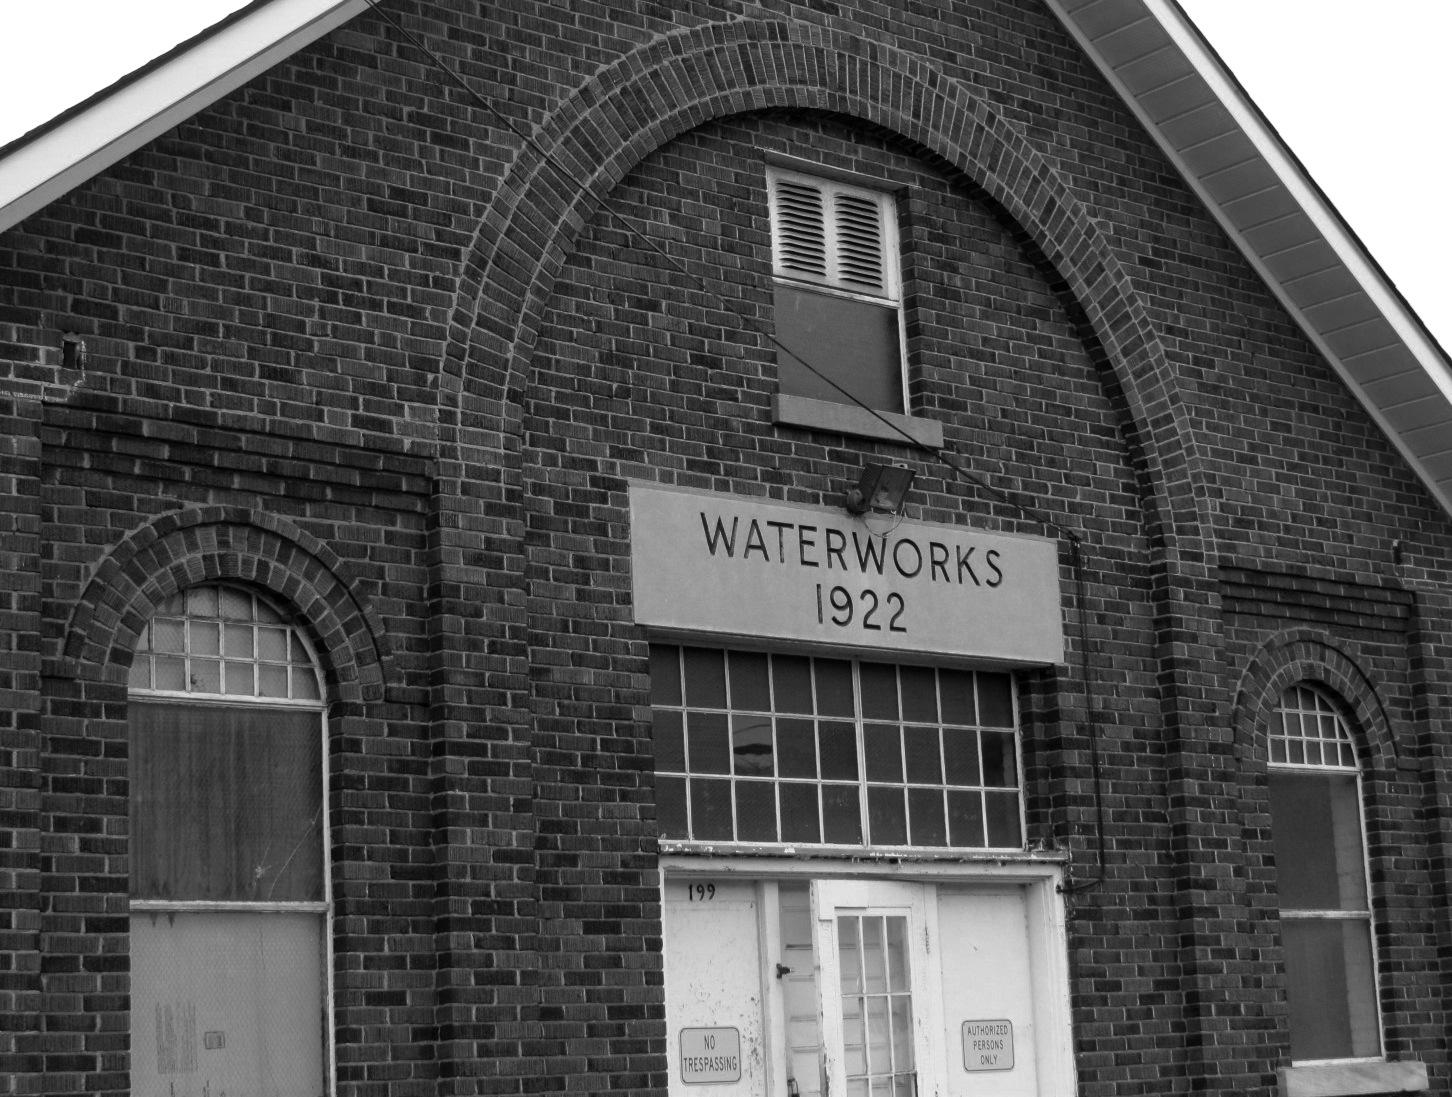 UrbEx Barrie: The Waterworks